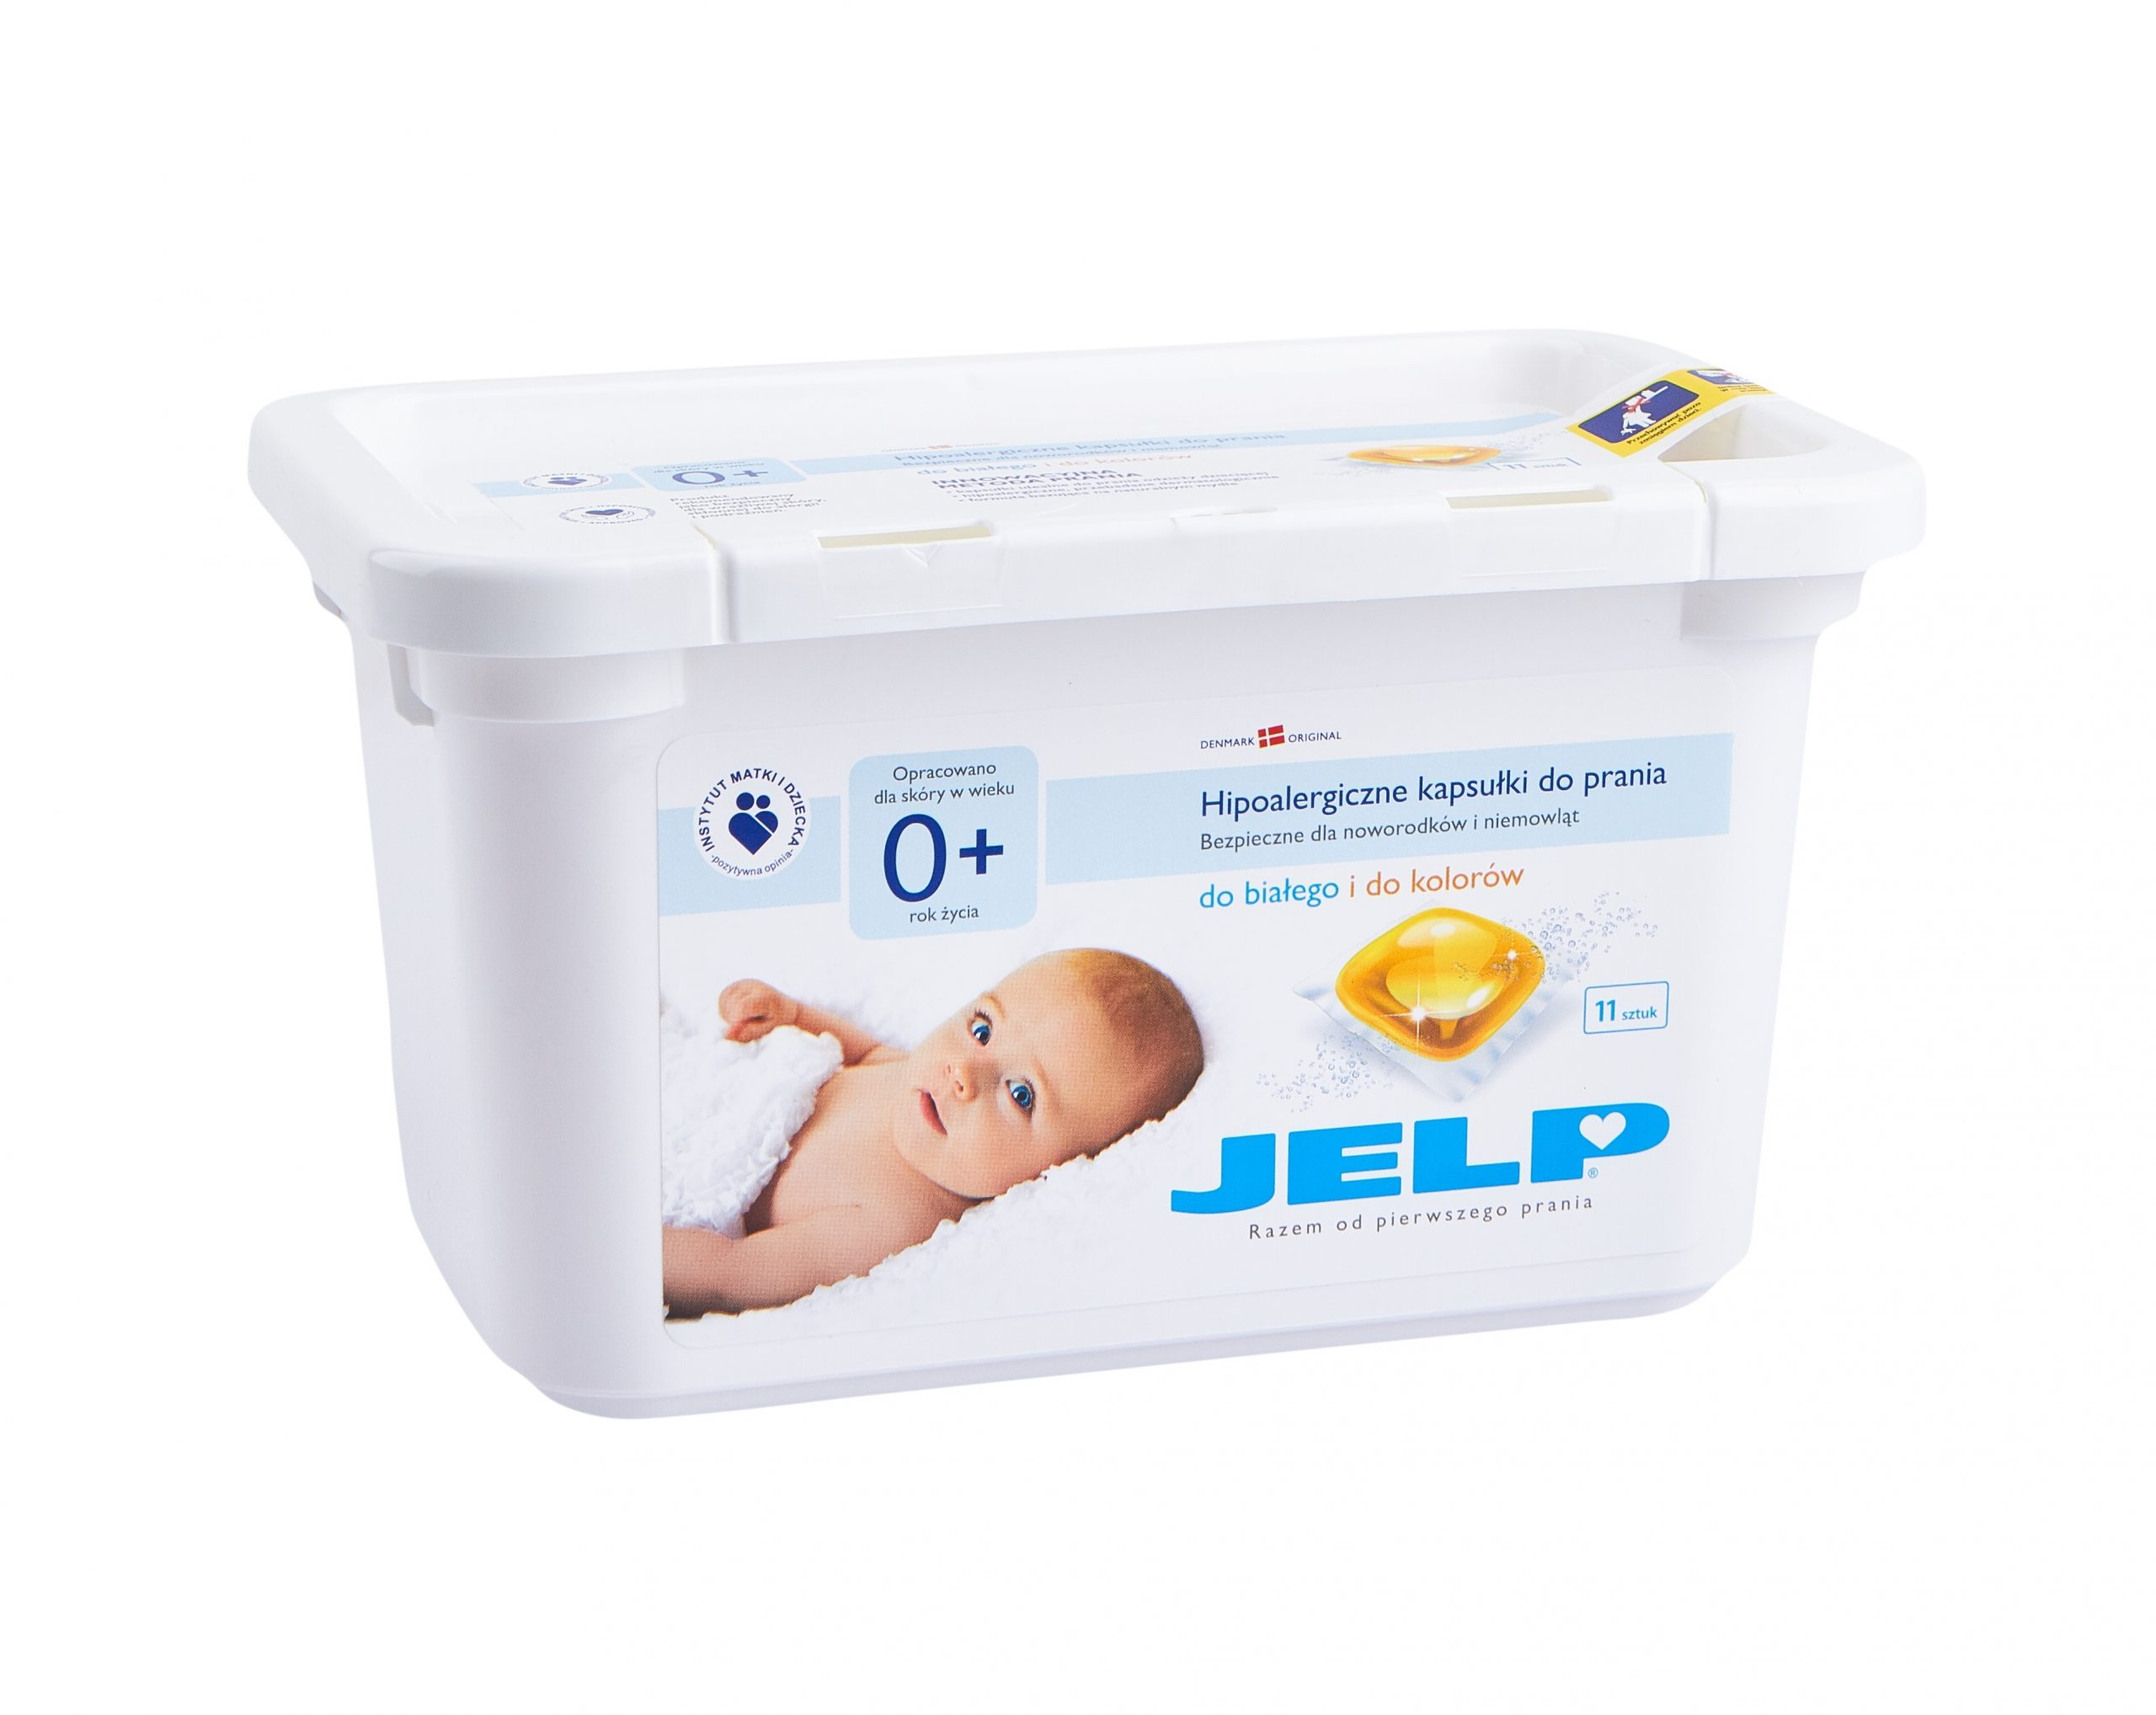 JELP 0+ hipoalergiczne kapsulki do prania 11 szt